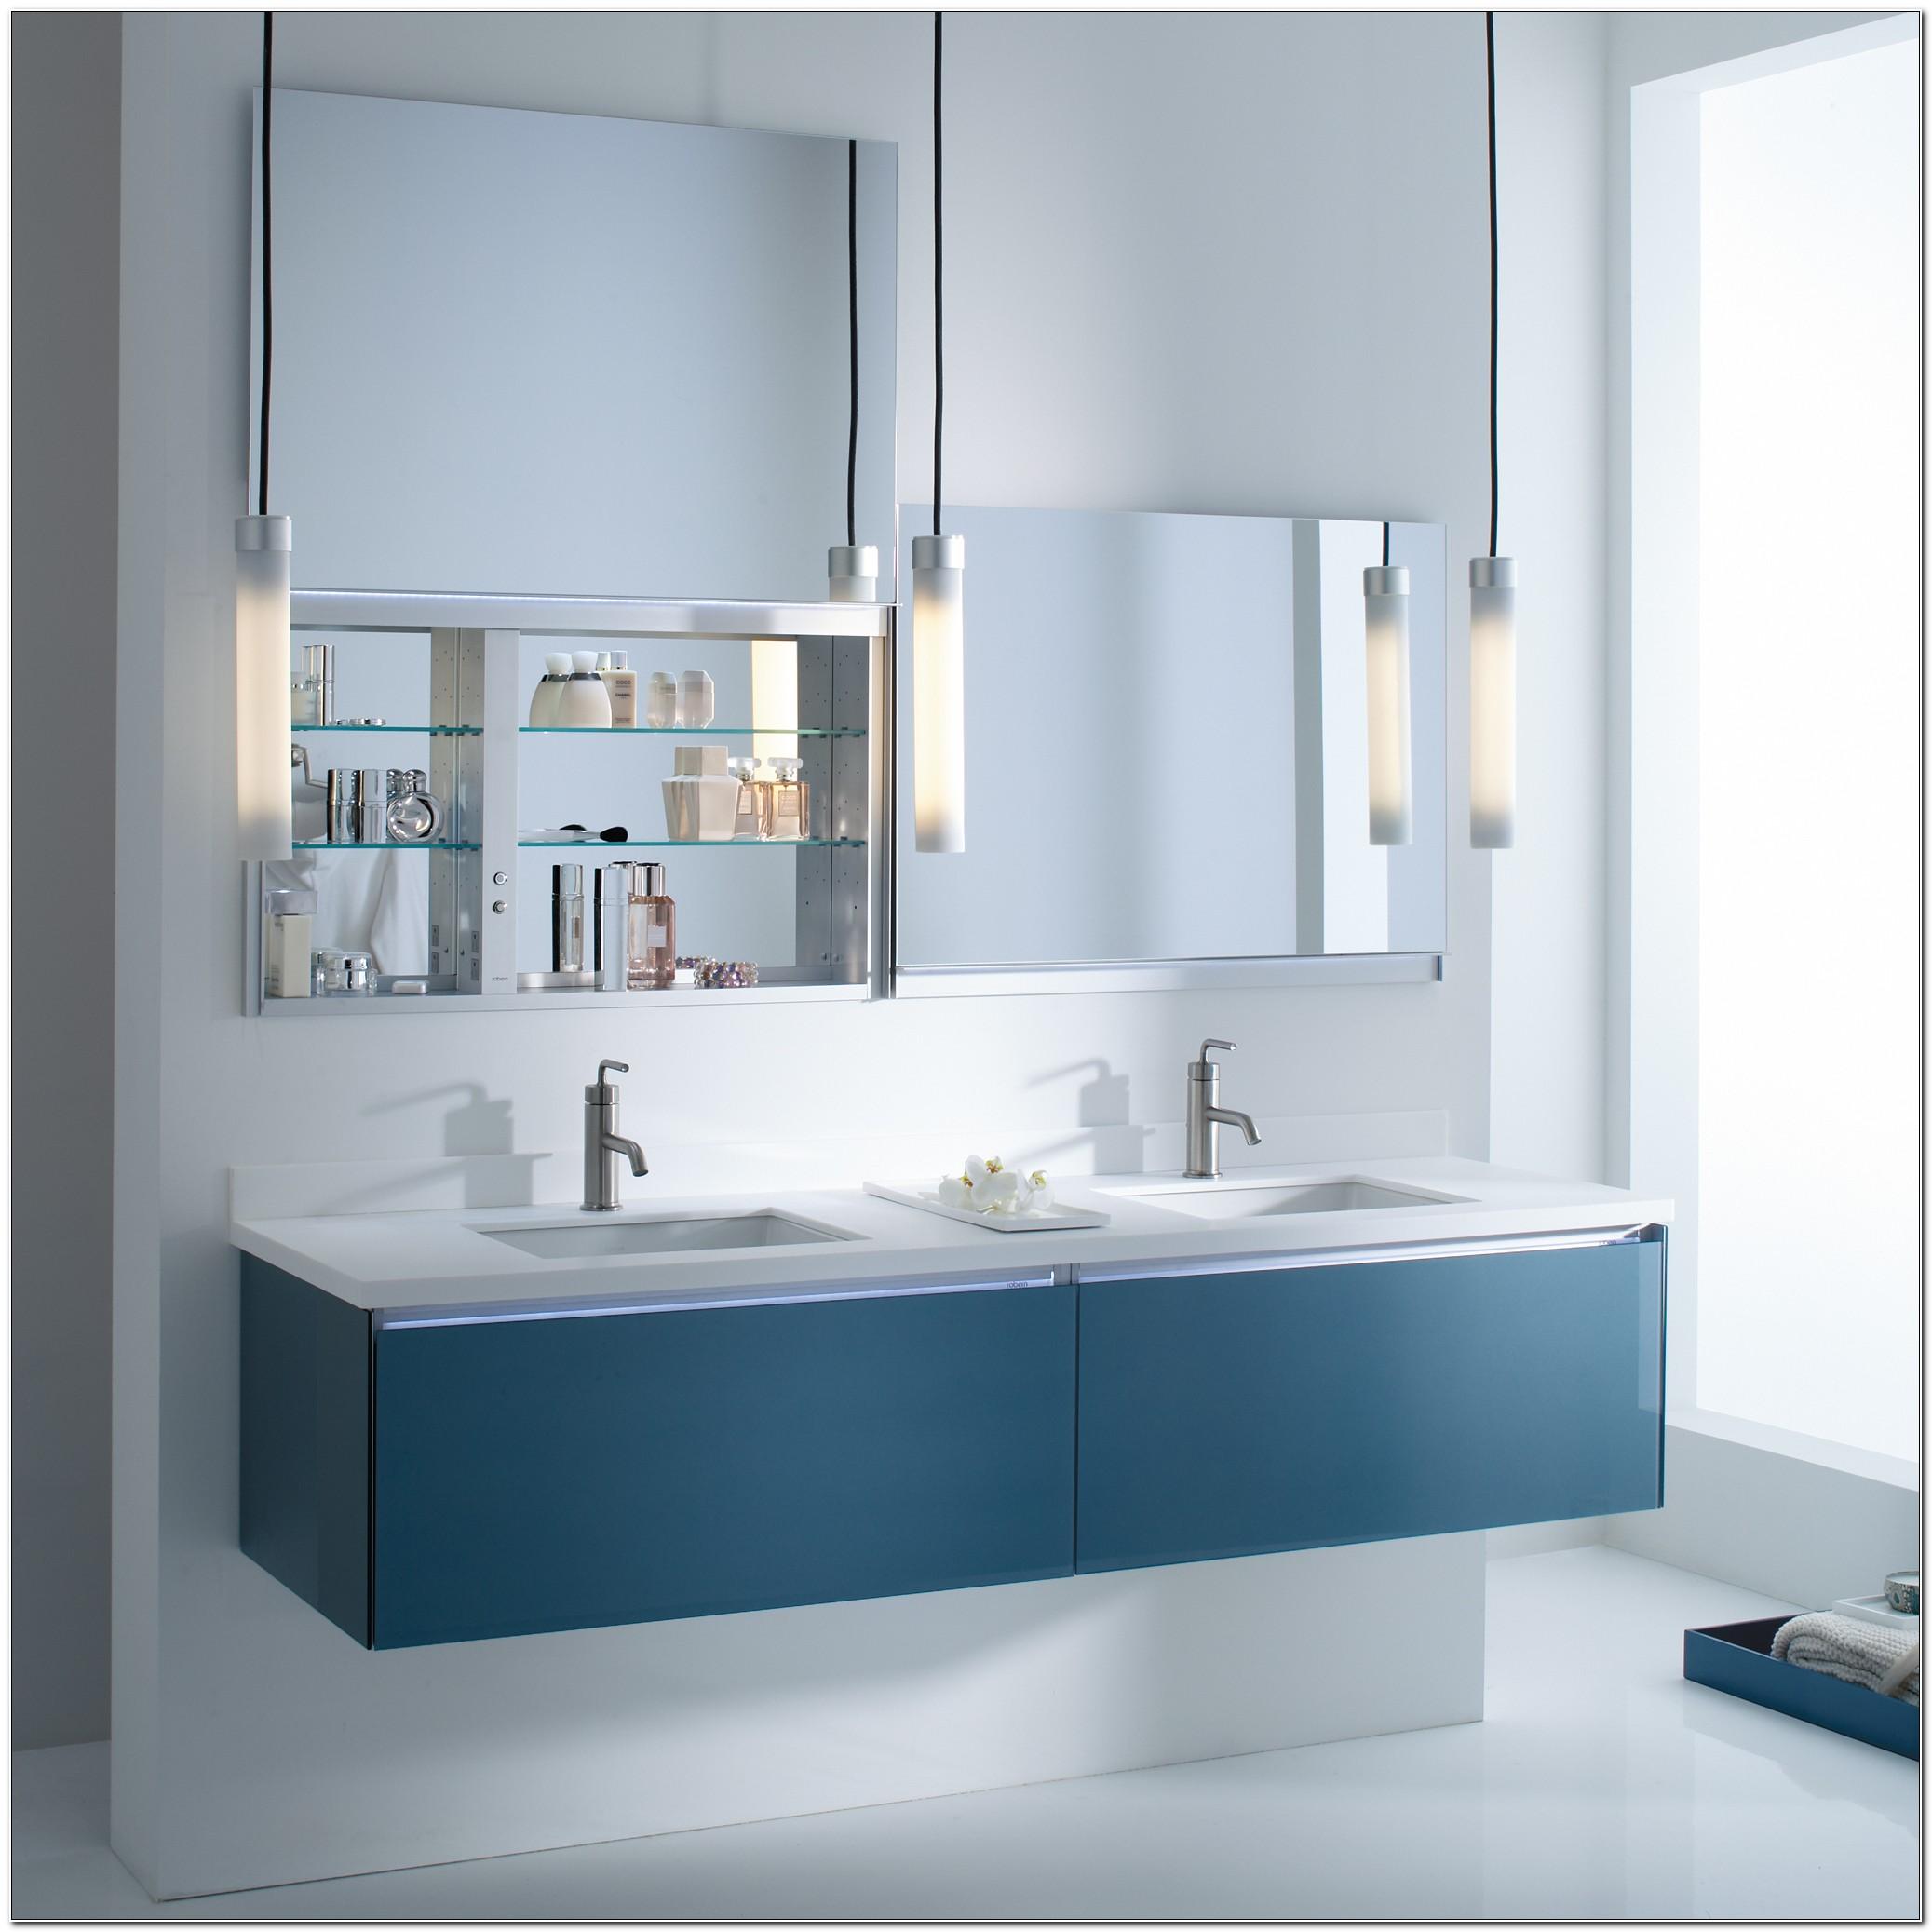 Robern Uplift Mirrored Medicine Cabinets